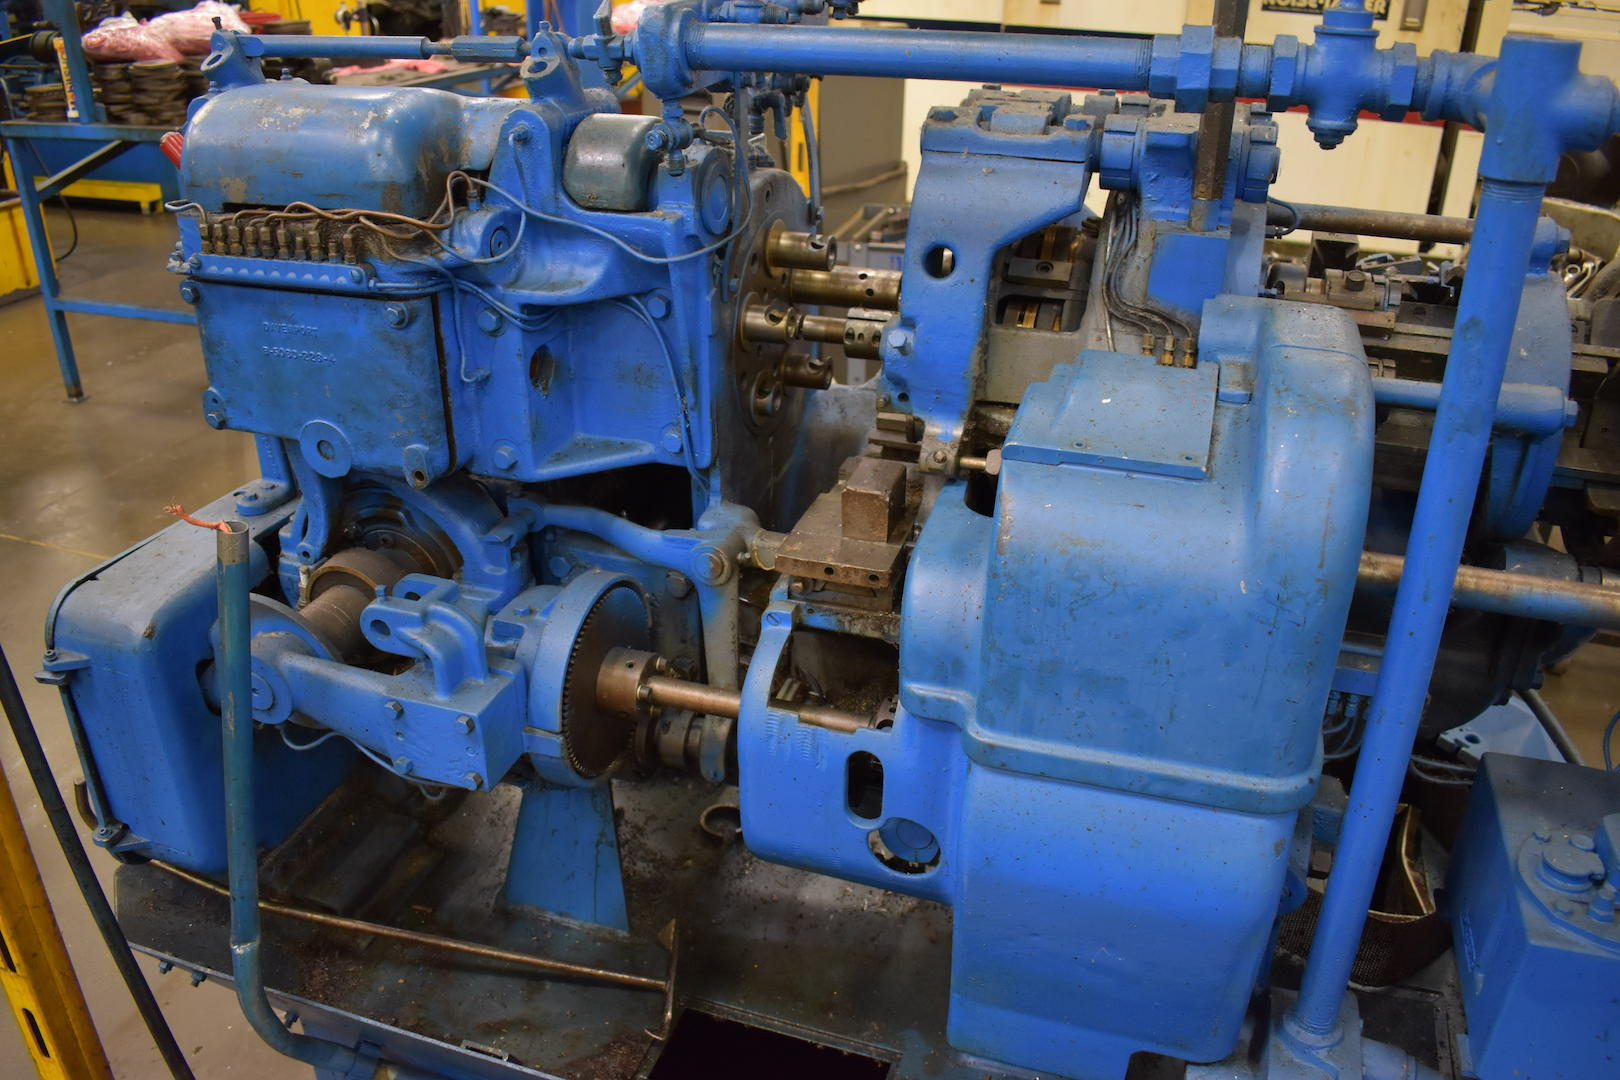 Lot 46 - DAVENPORT MODEL B OVERSIZE 5-SPINDLE AUTOMATIC SCREW MACHINE